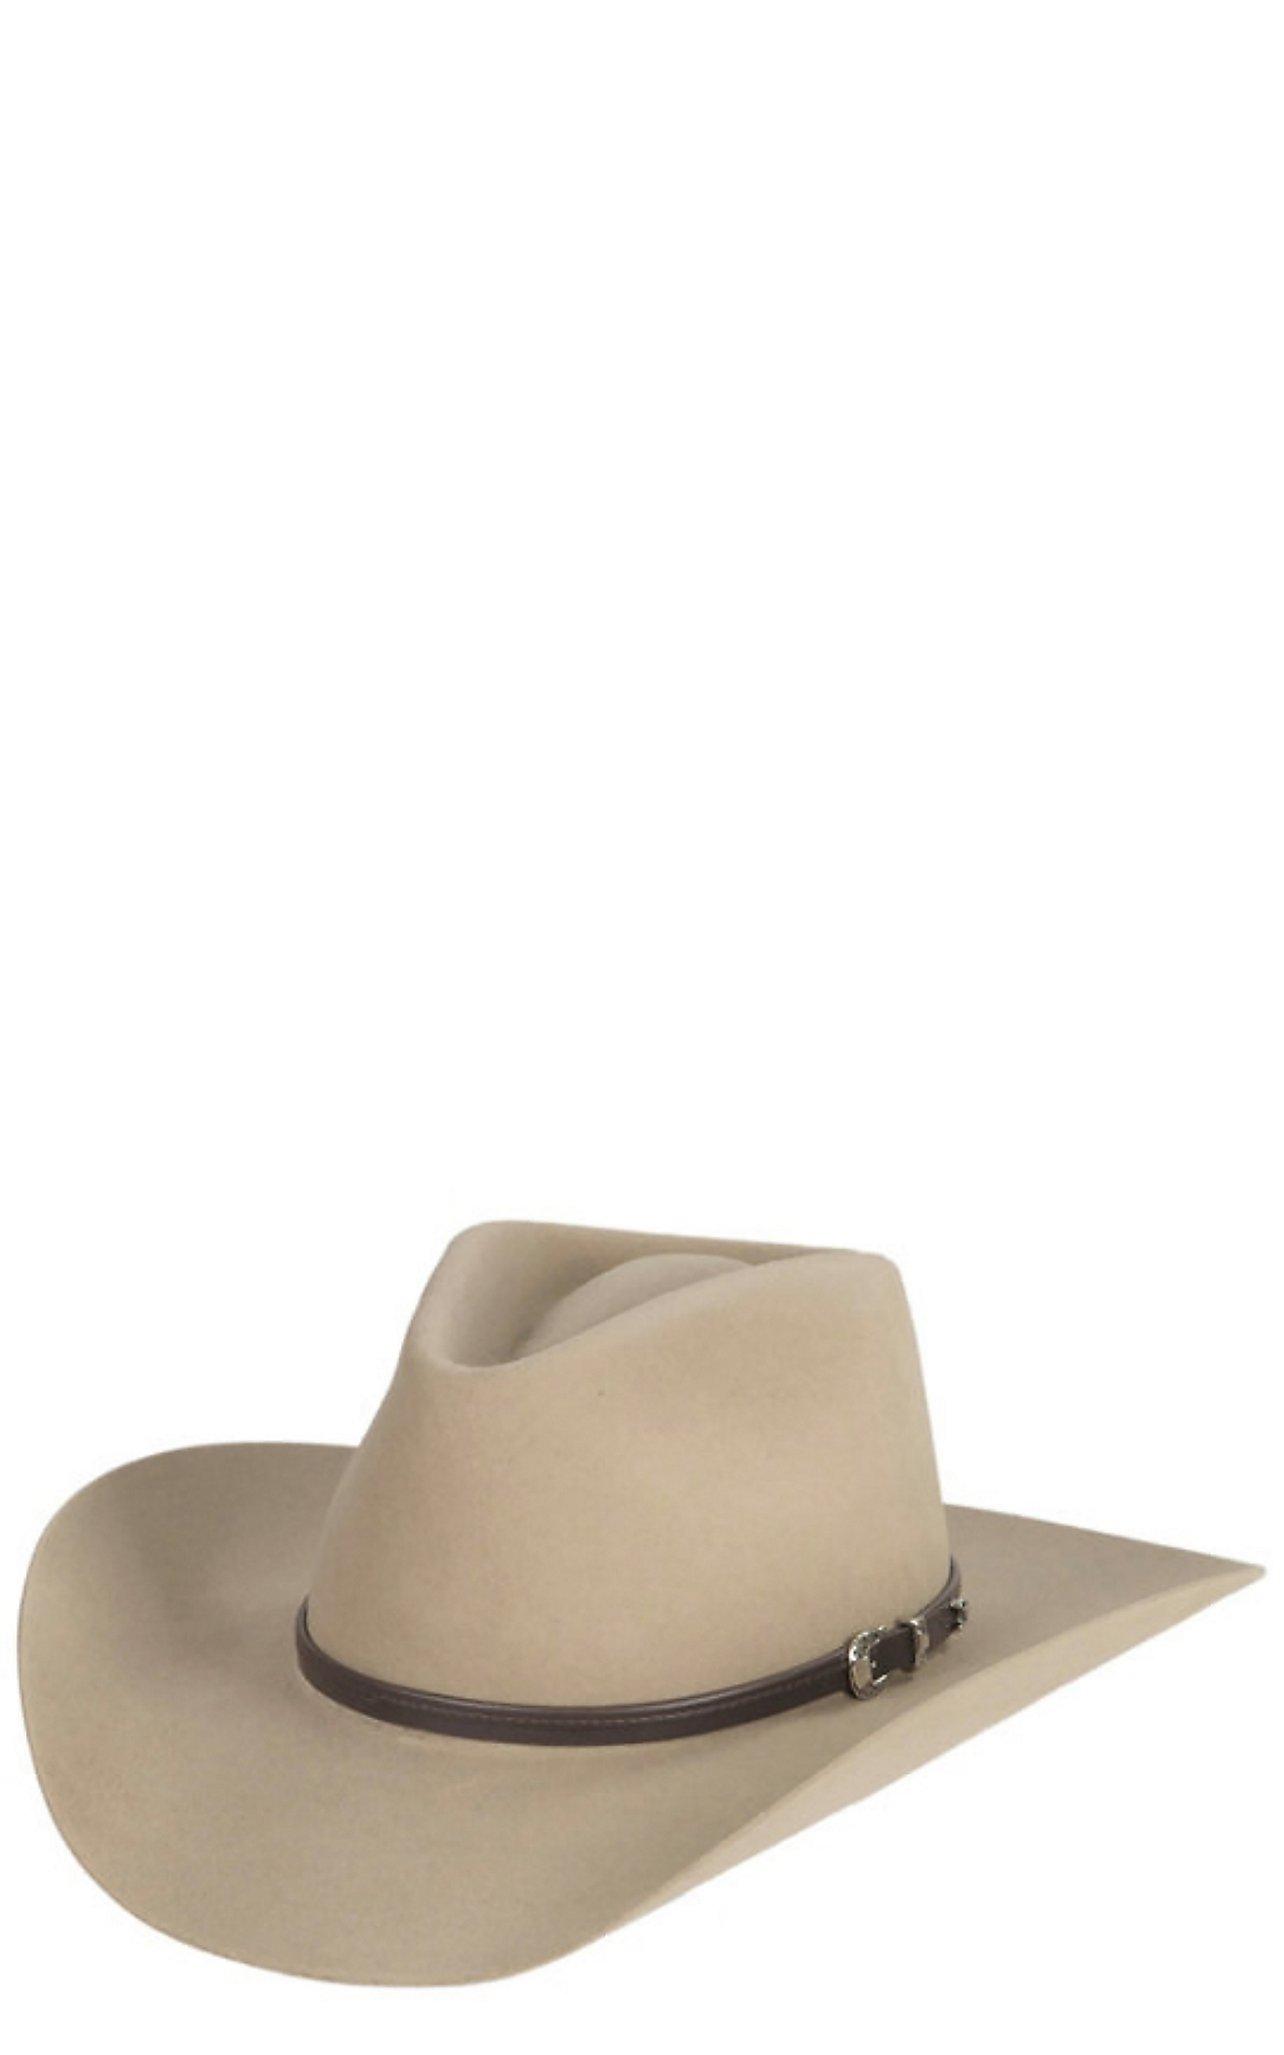 5fea191c610 Stetson 4X Seneca Silversand Buffalo Felt Cowboy Hat